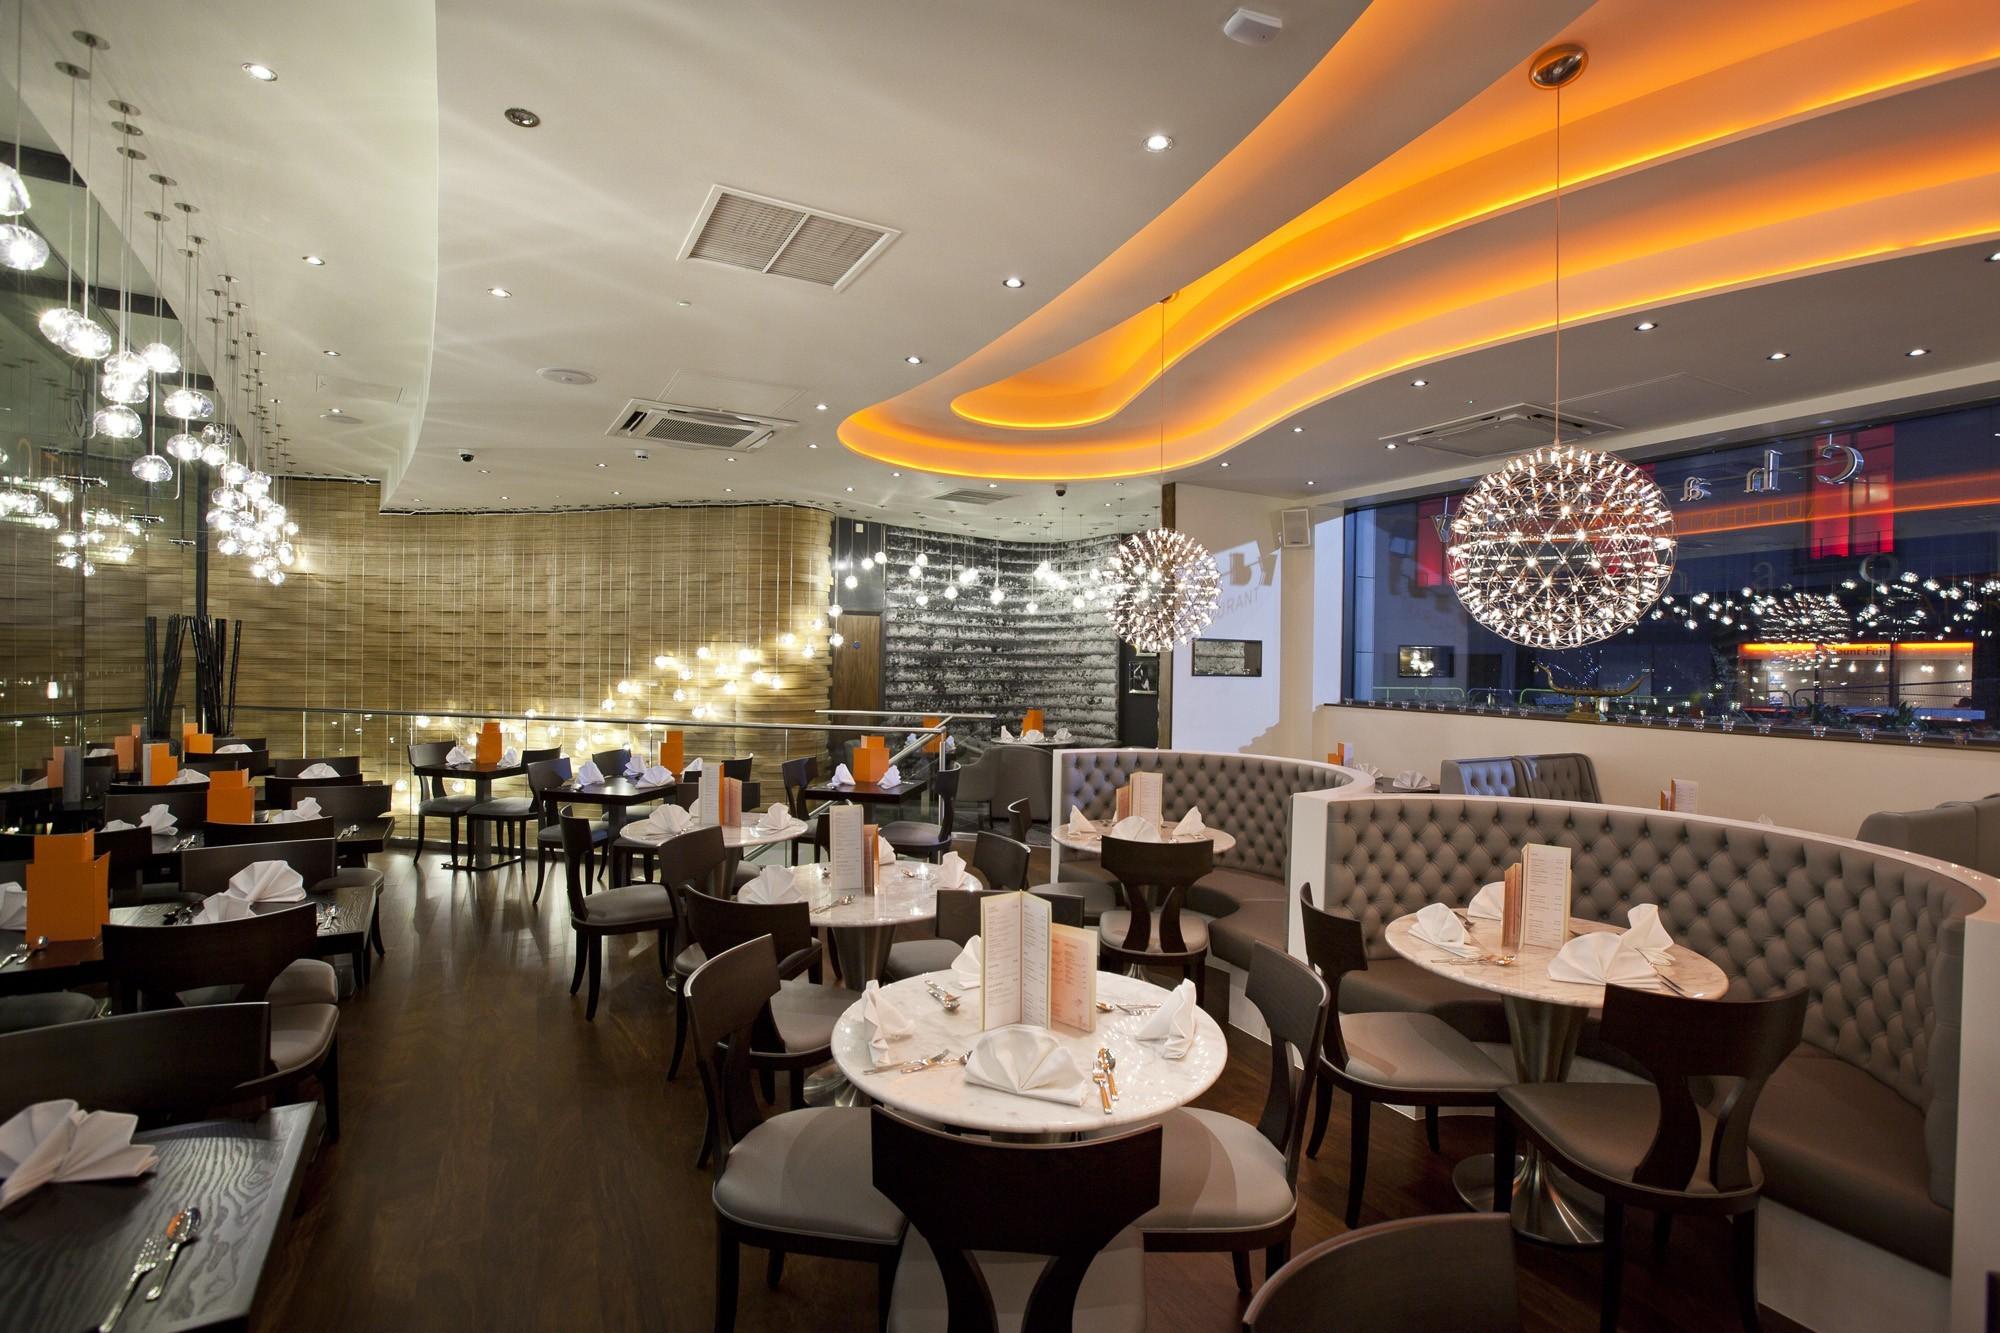 Best Restaurants For Vegetarian Food In Manchester